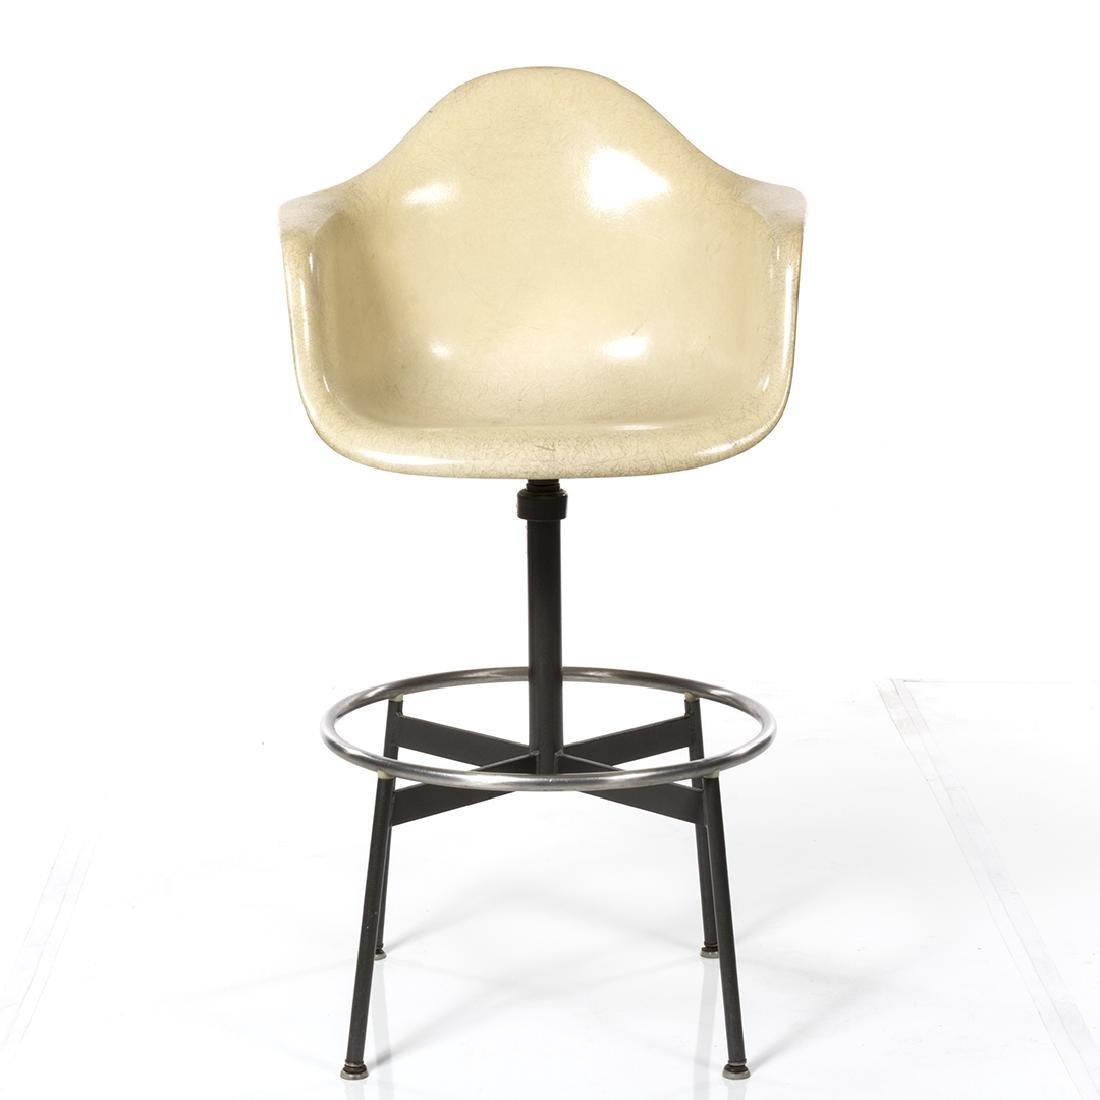 Charles Eames Drafting Stool - 2